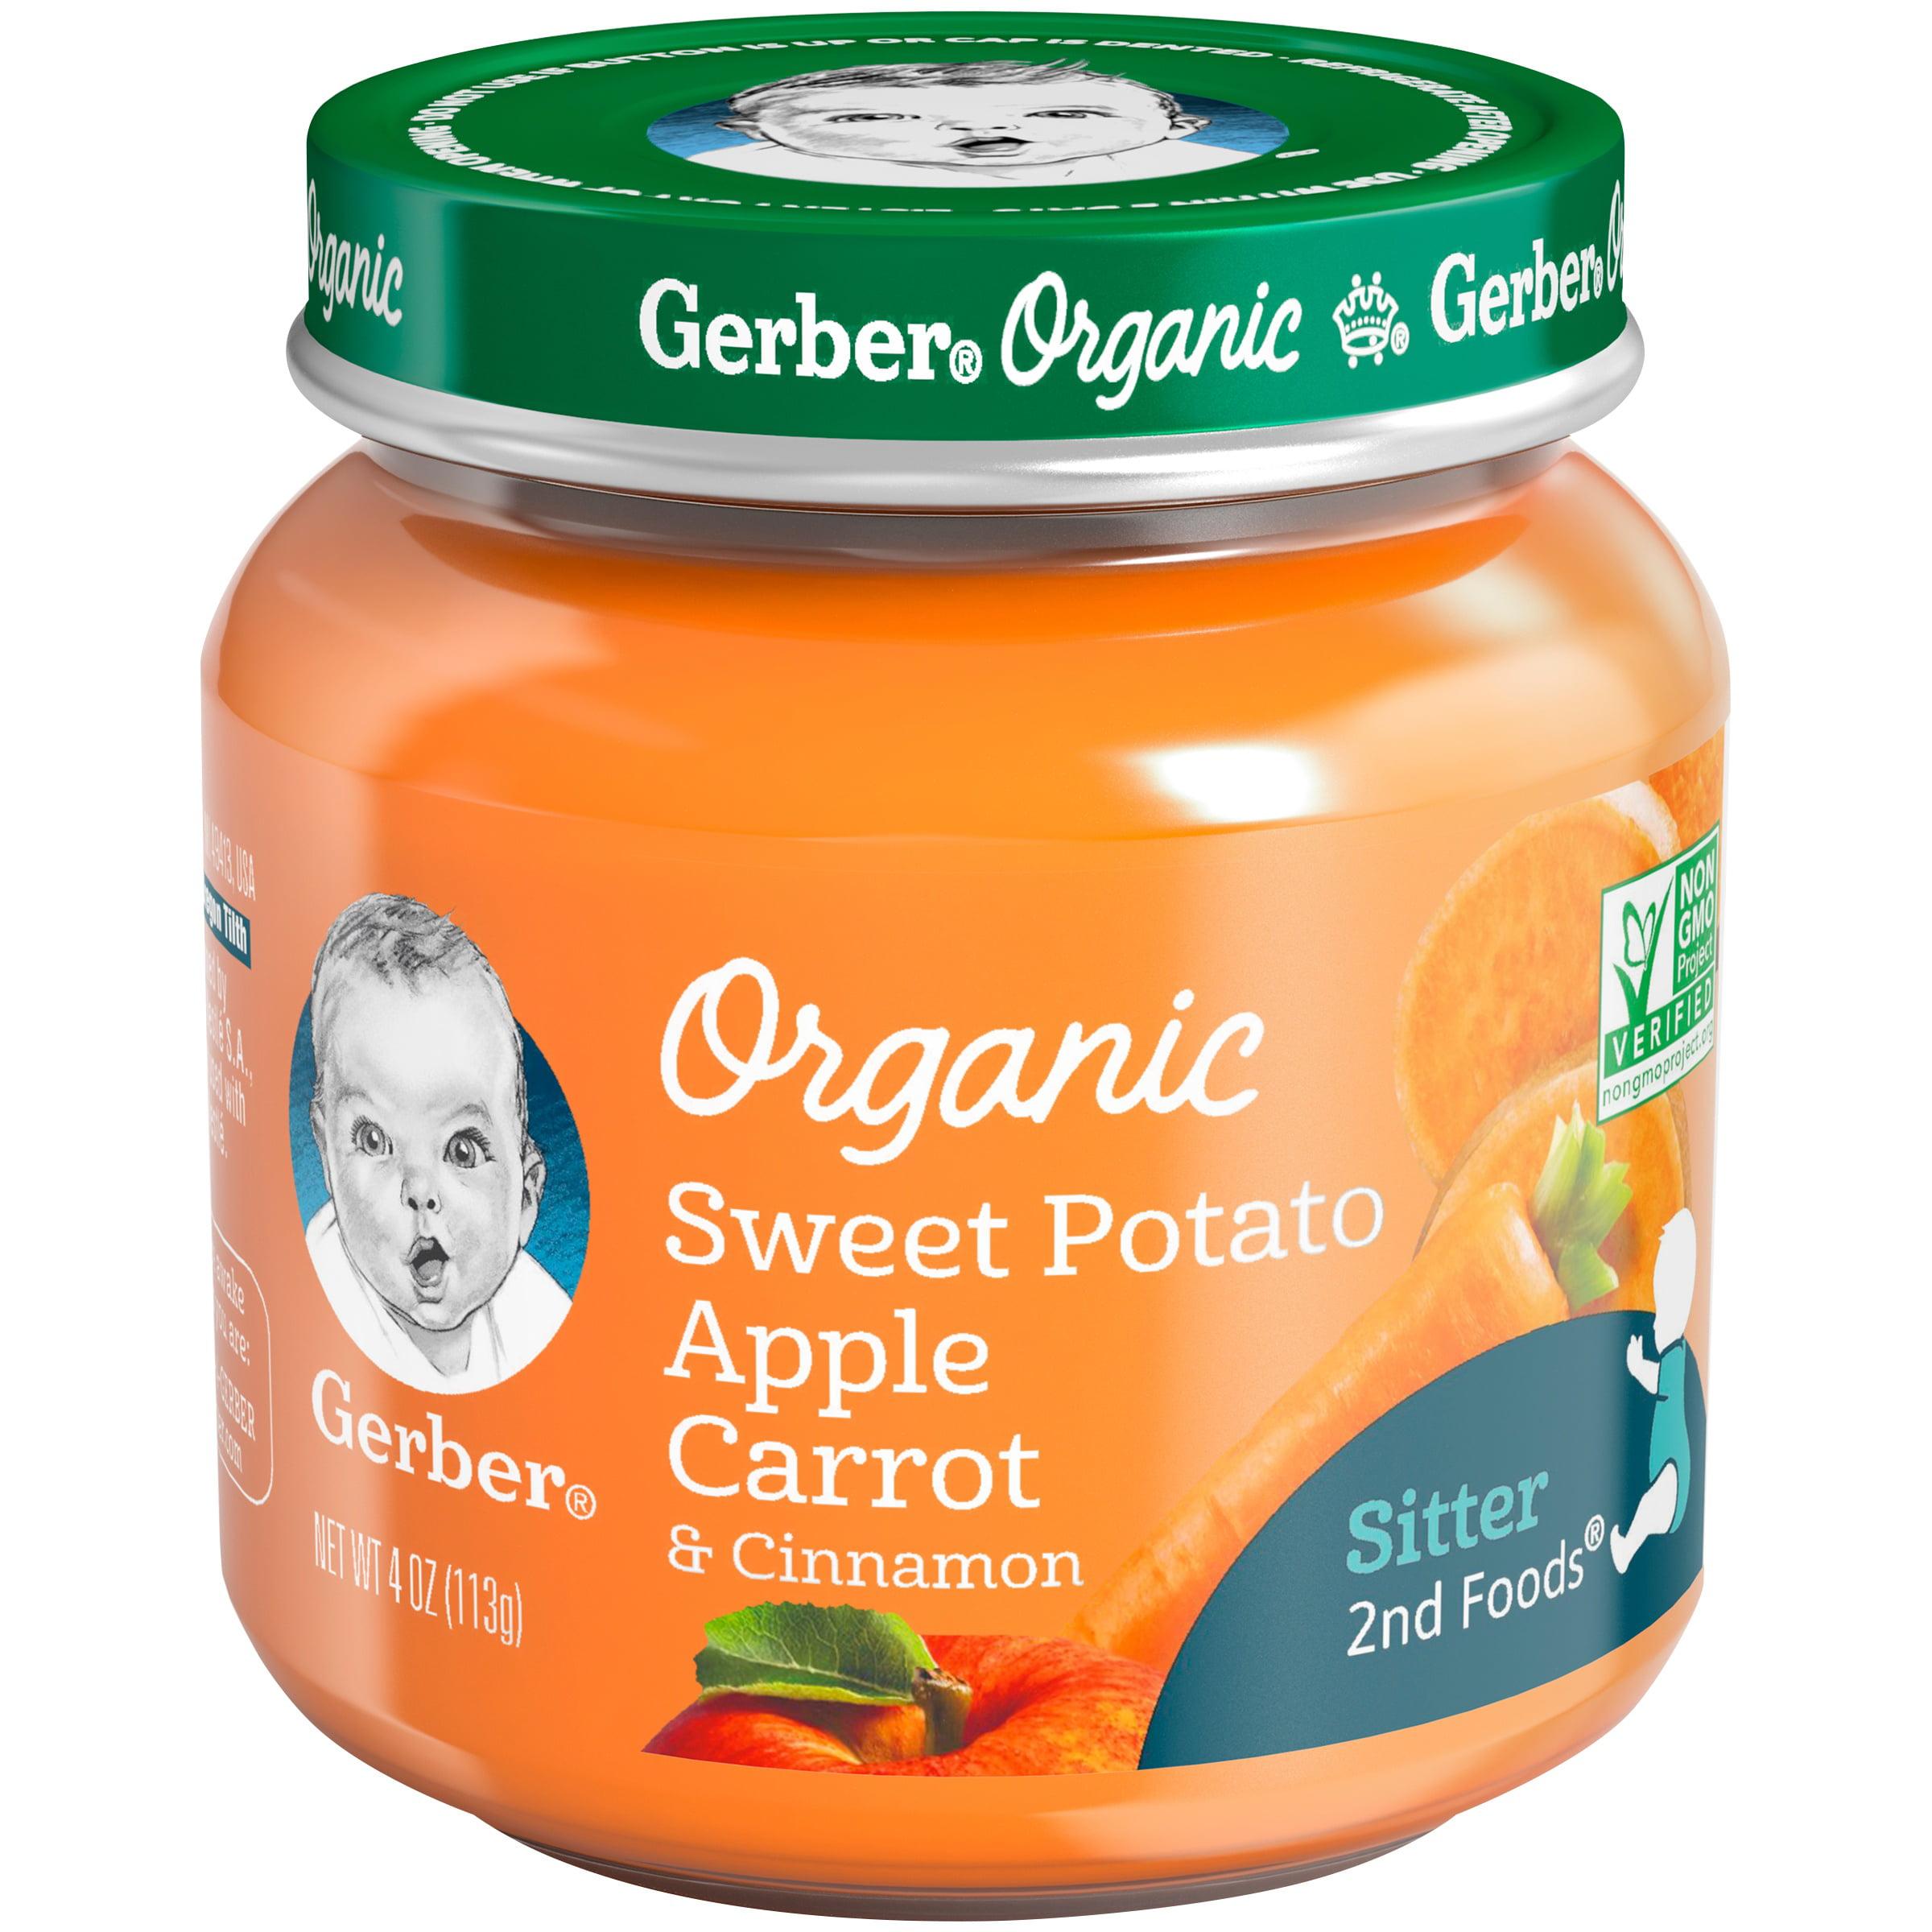 Gerber Organic 2nd Foods Sweet Potato Apple Carrot & Cinnamon Baby Food, 4 oz. Glass Jar (Pack of 6)